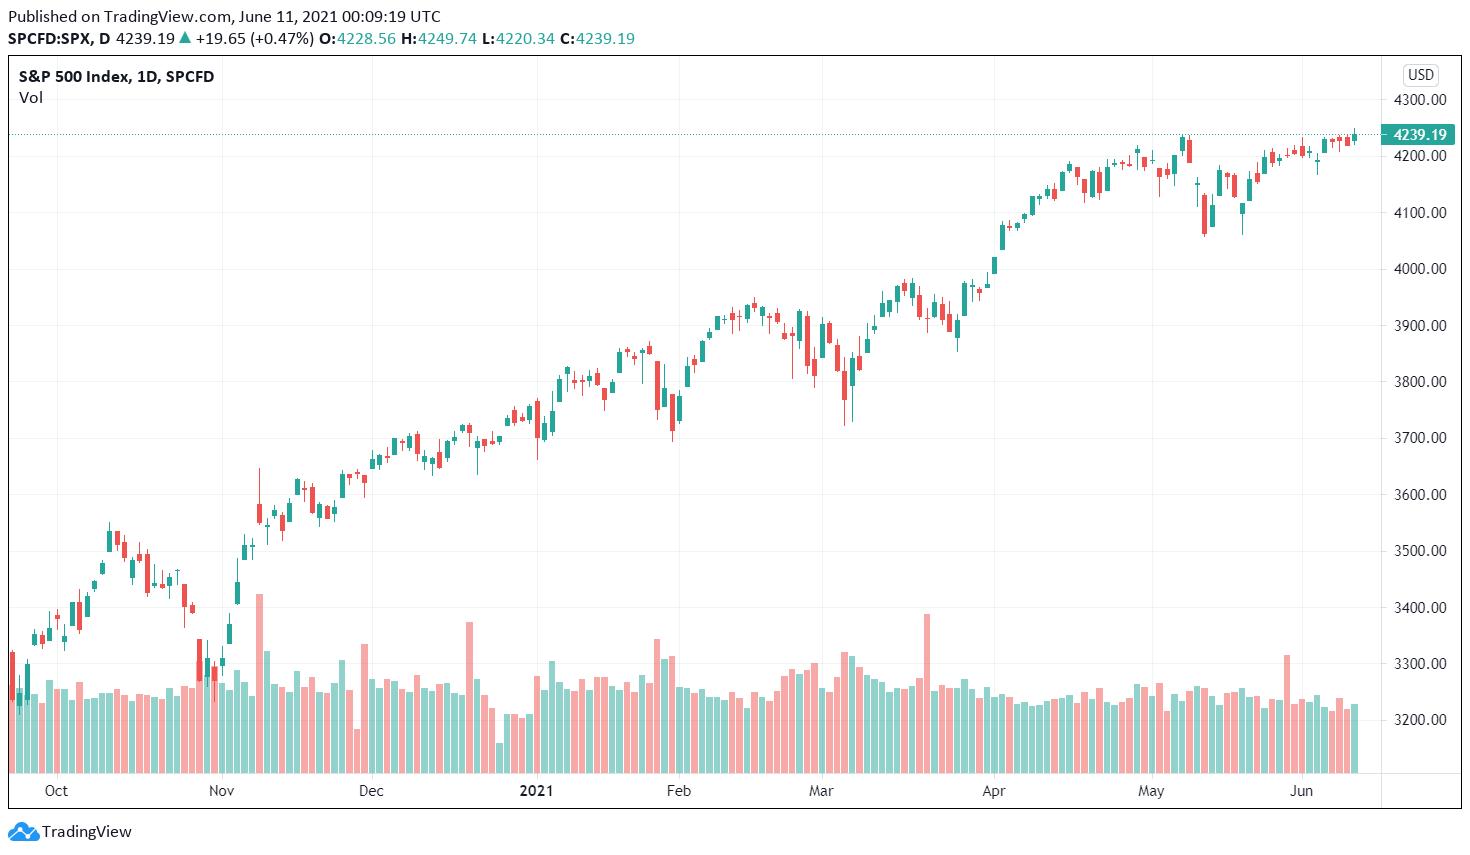 Wall Street SP 500